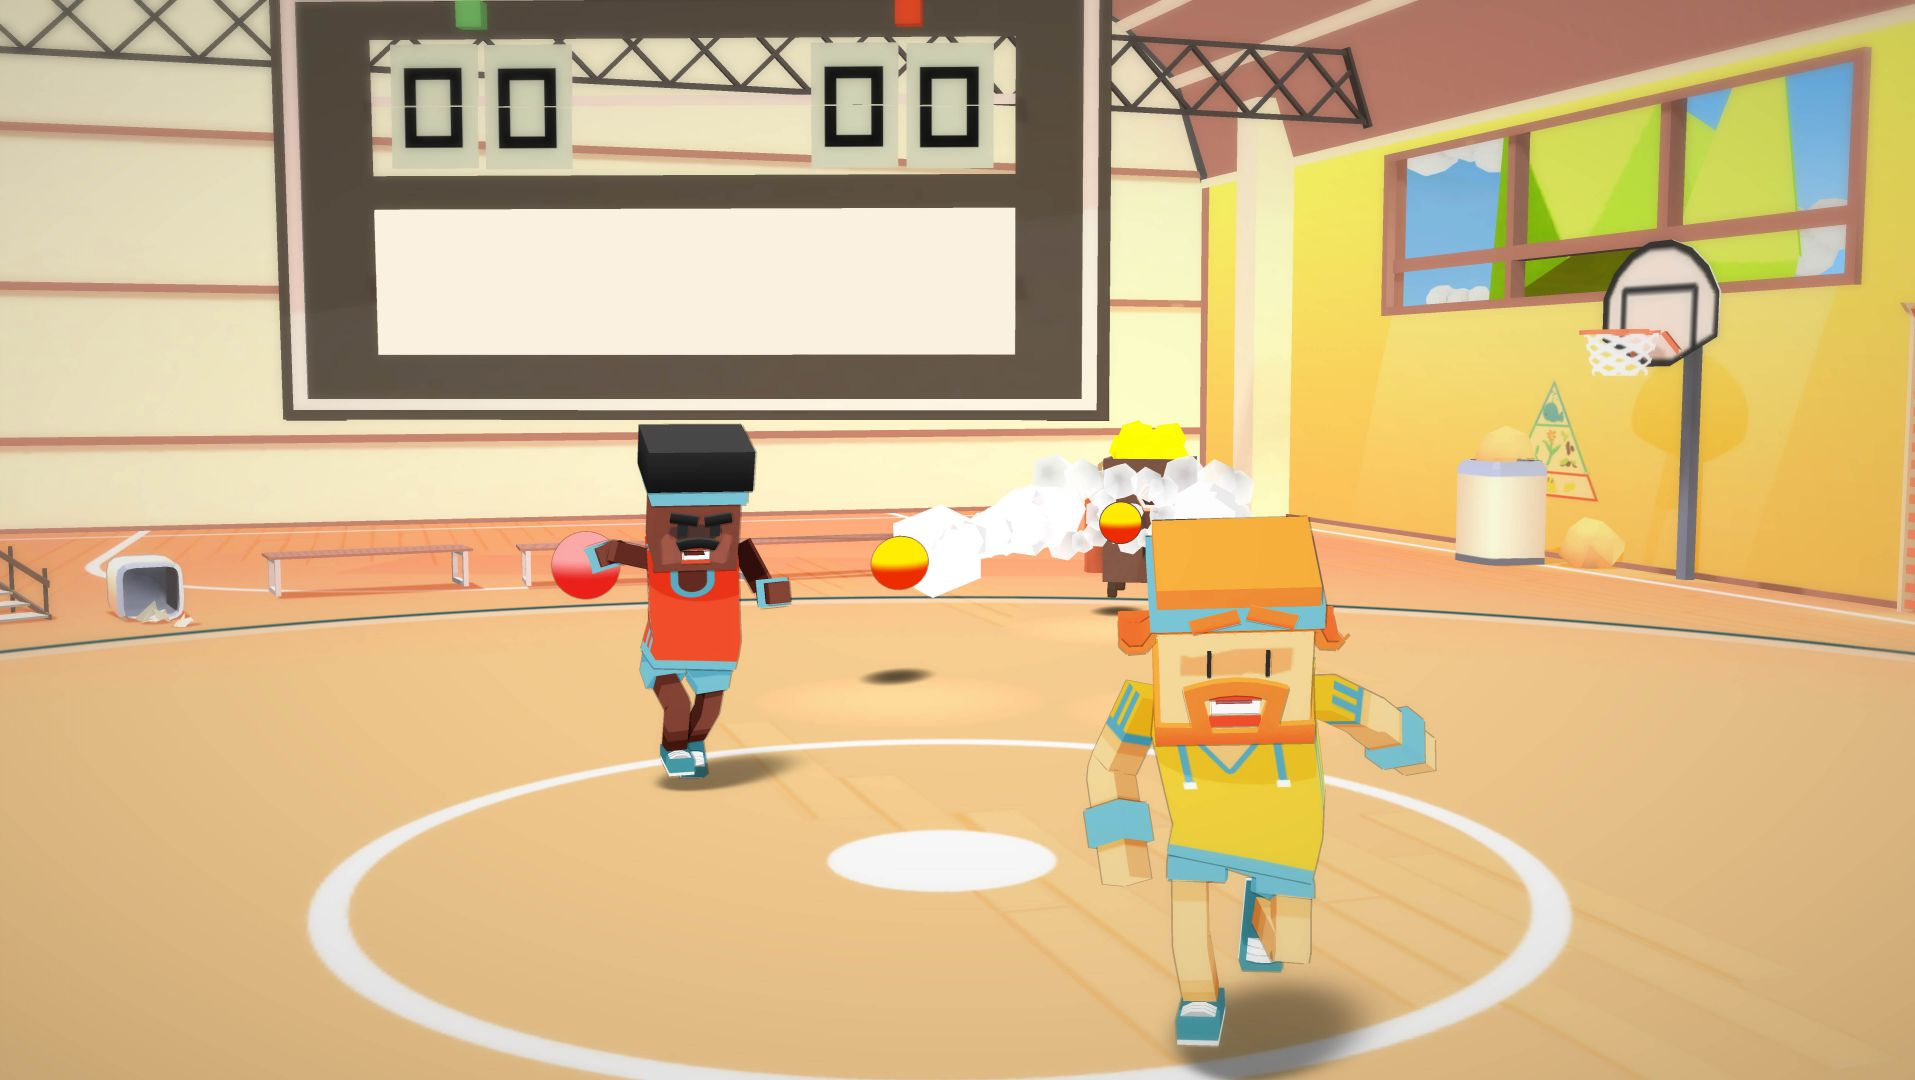 Stikbold! A Dodgeball Adventure Review